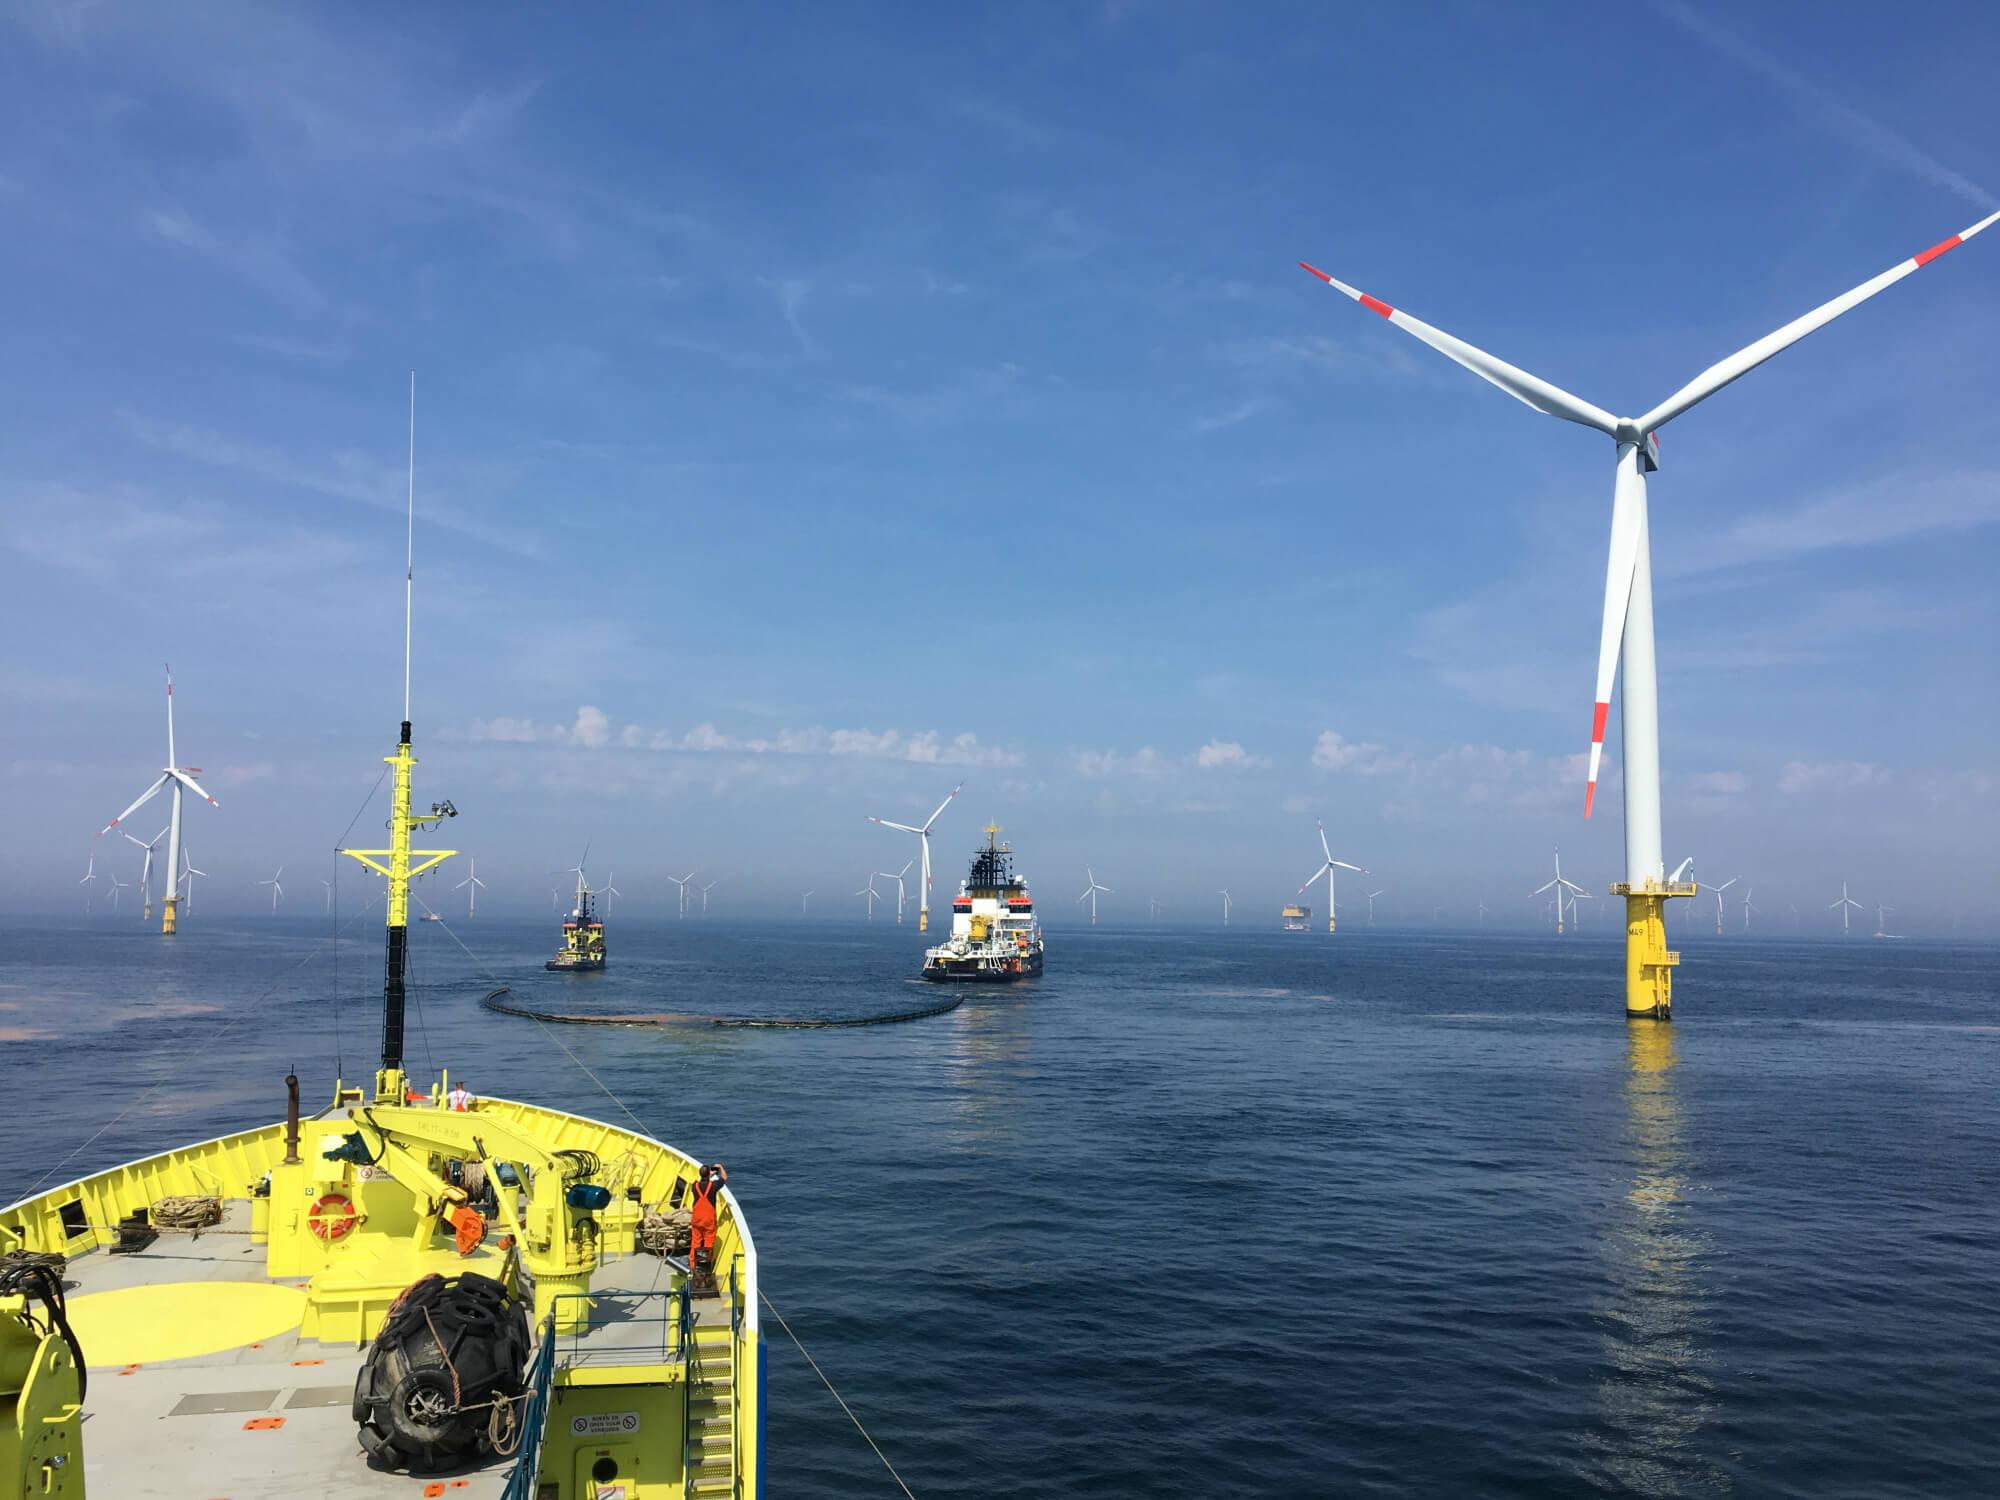 Internationale oefening oliebestrijding bij Duits offshore windpark